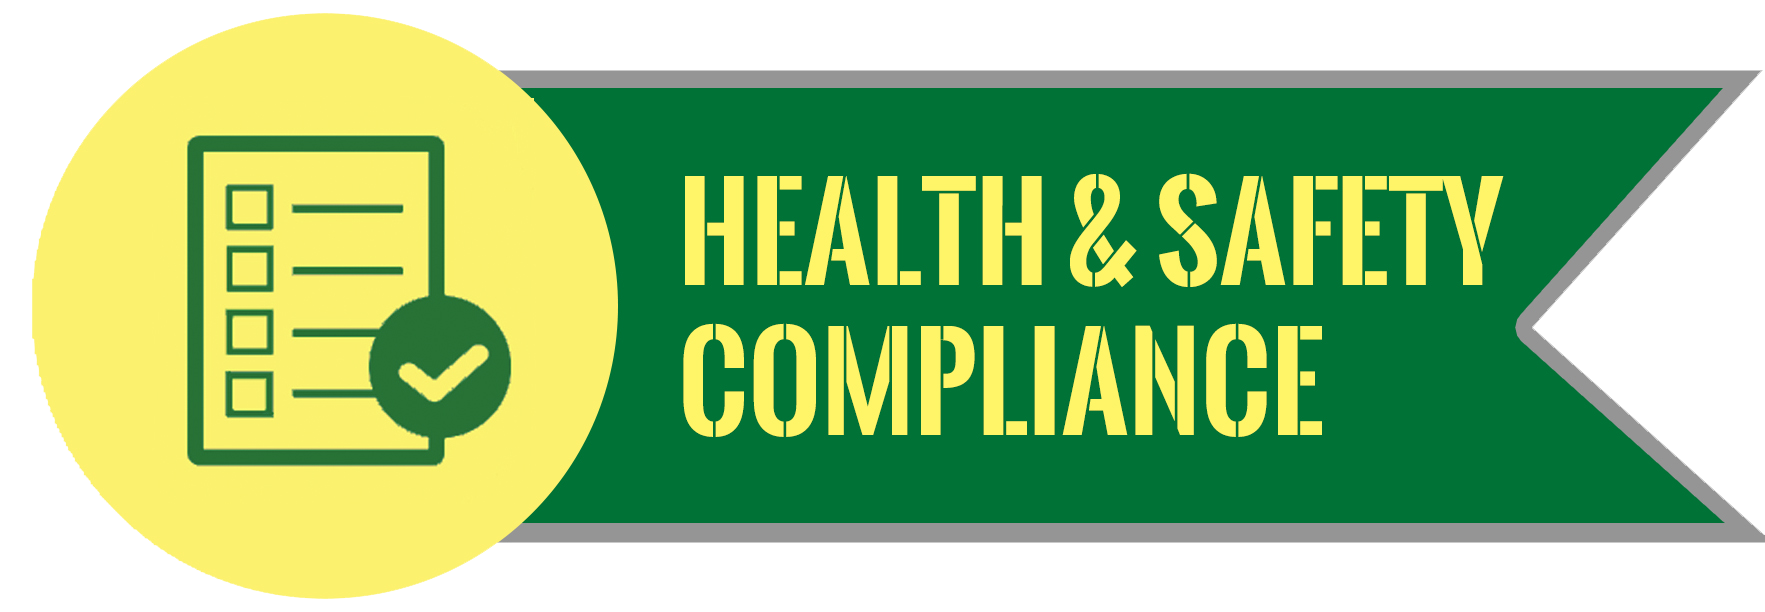 compliance3-768x266